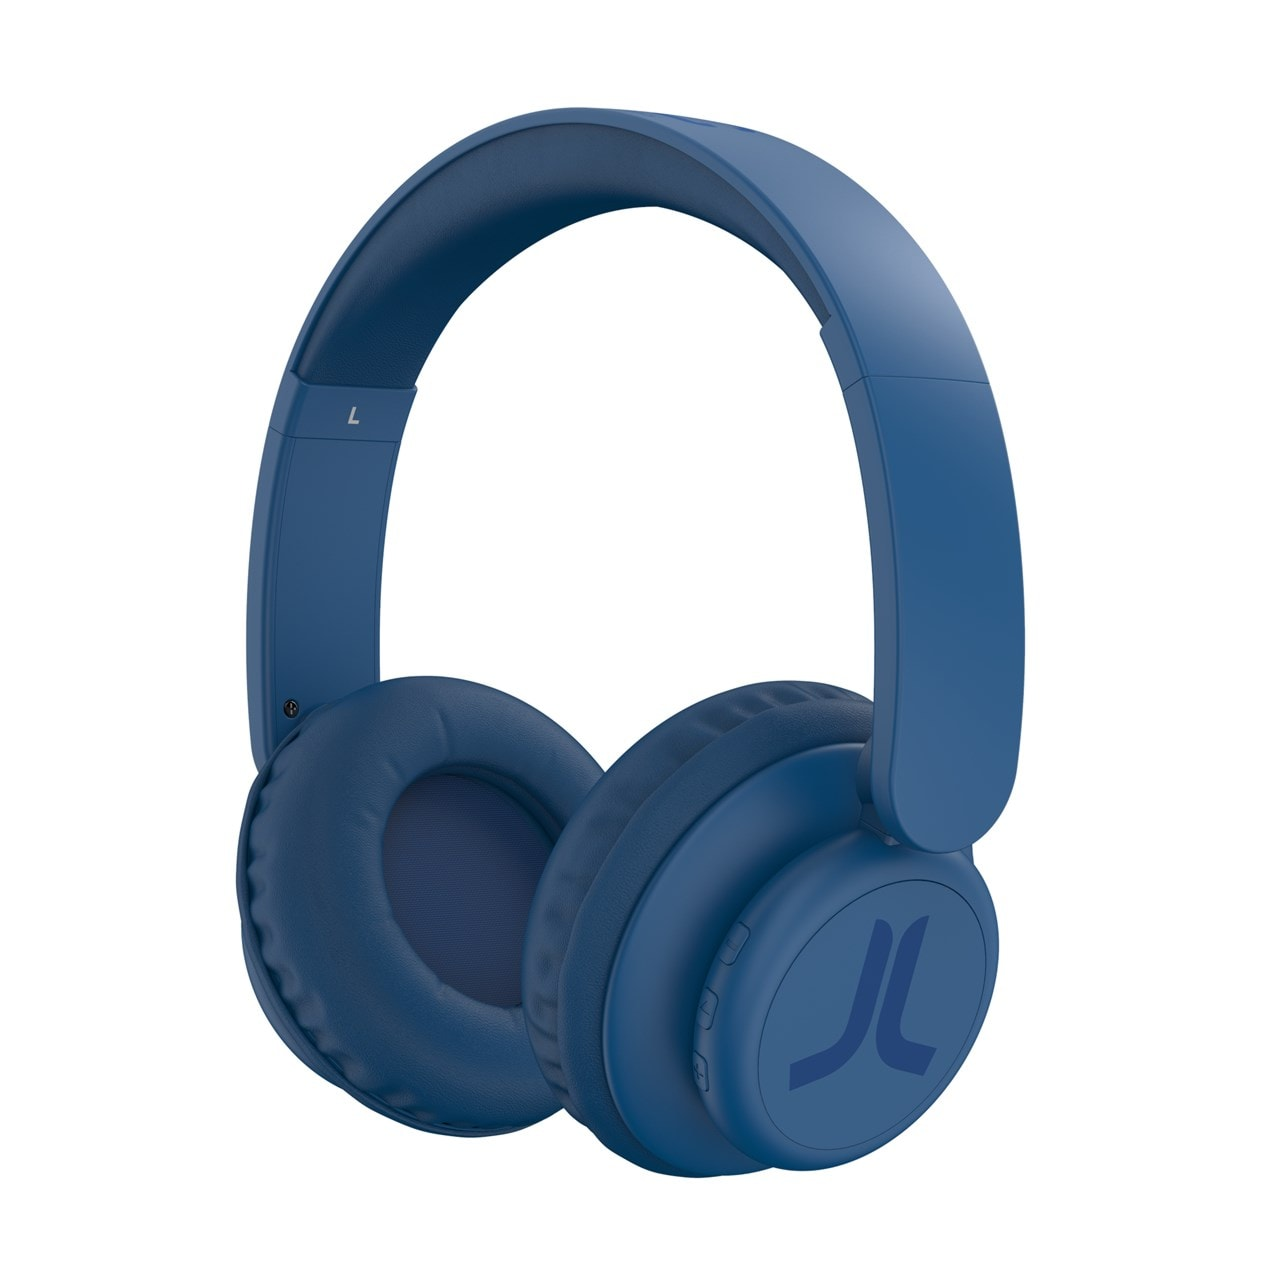 WeSC Navy Blue Bluetooth Headphones - 1